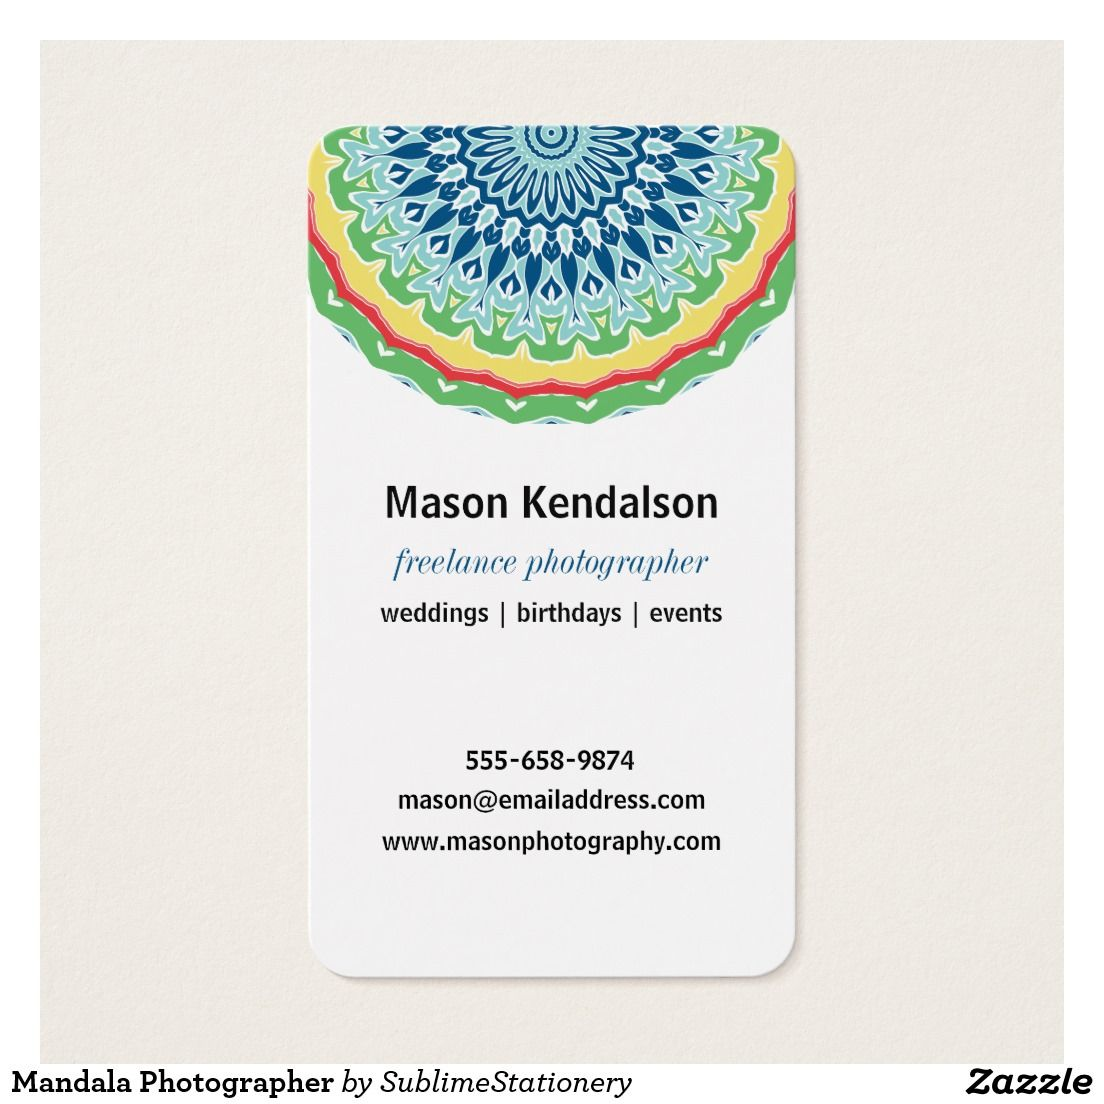 Mandala Photographer Business Card | Photographer business cards and ...